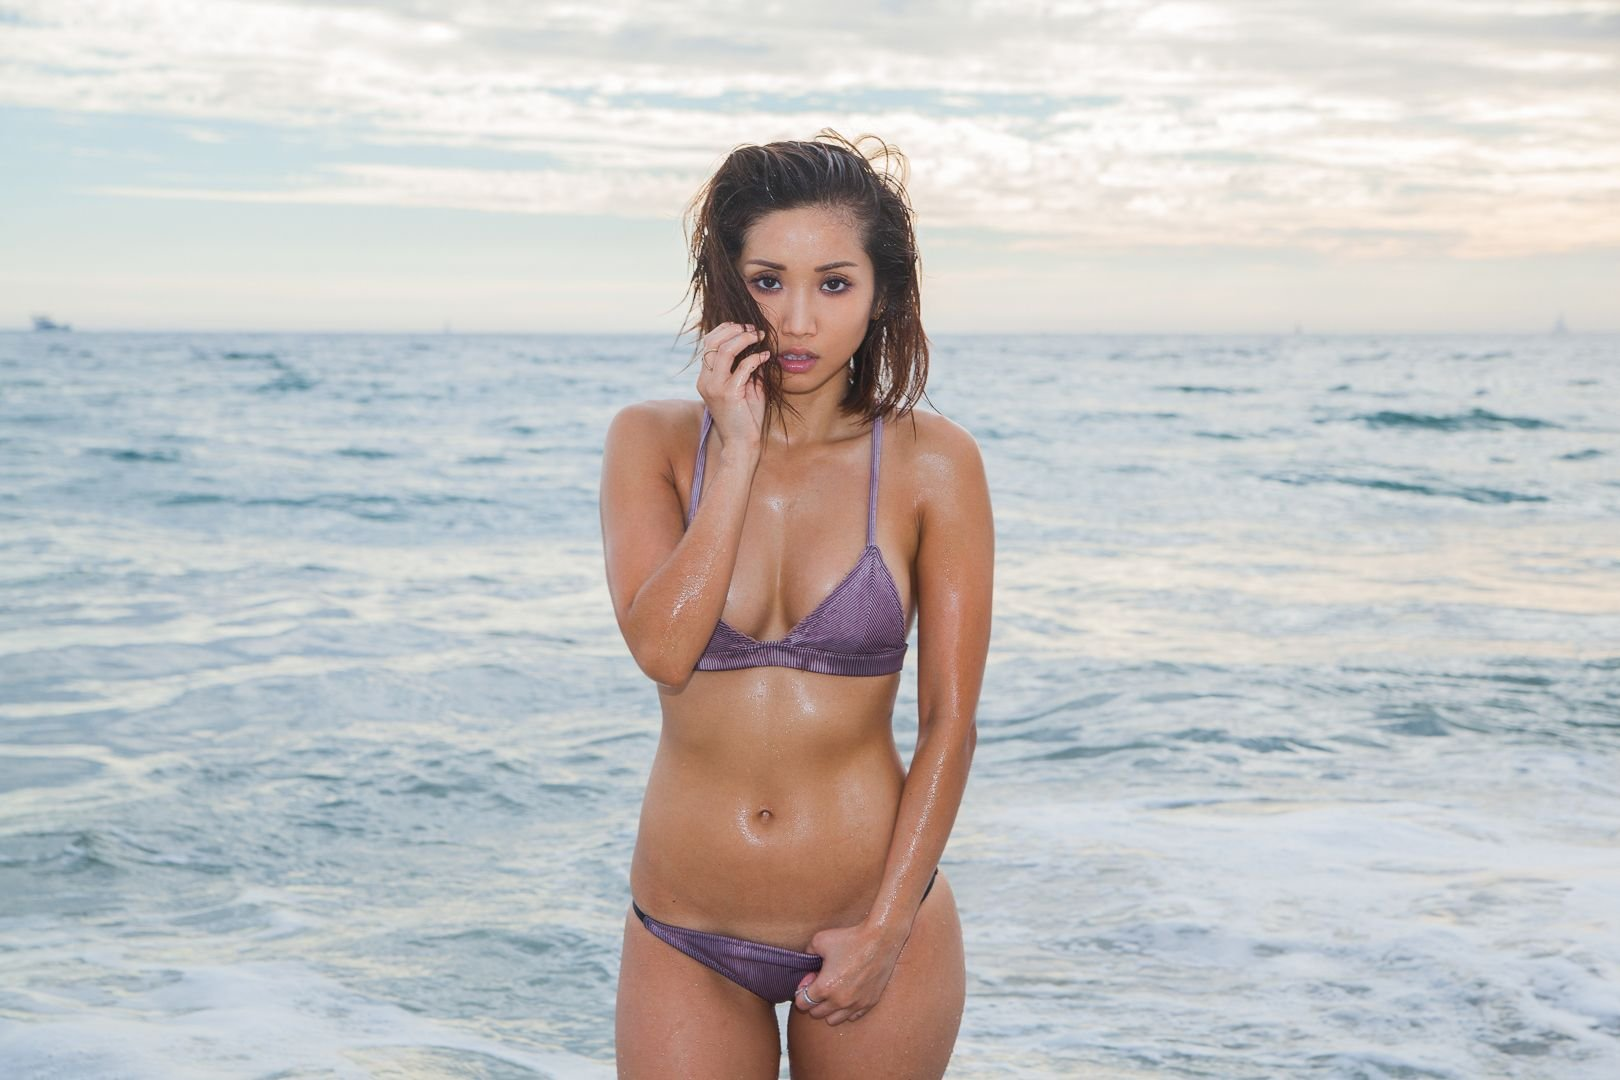 Brenda-Song-in-a-Bikini-2